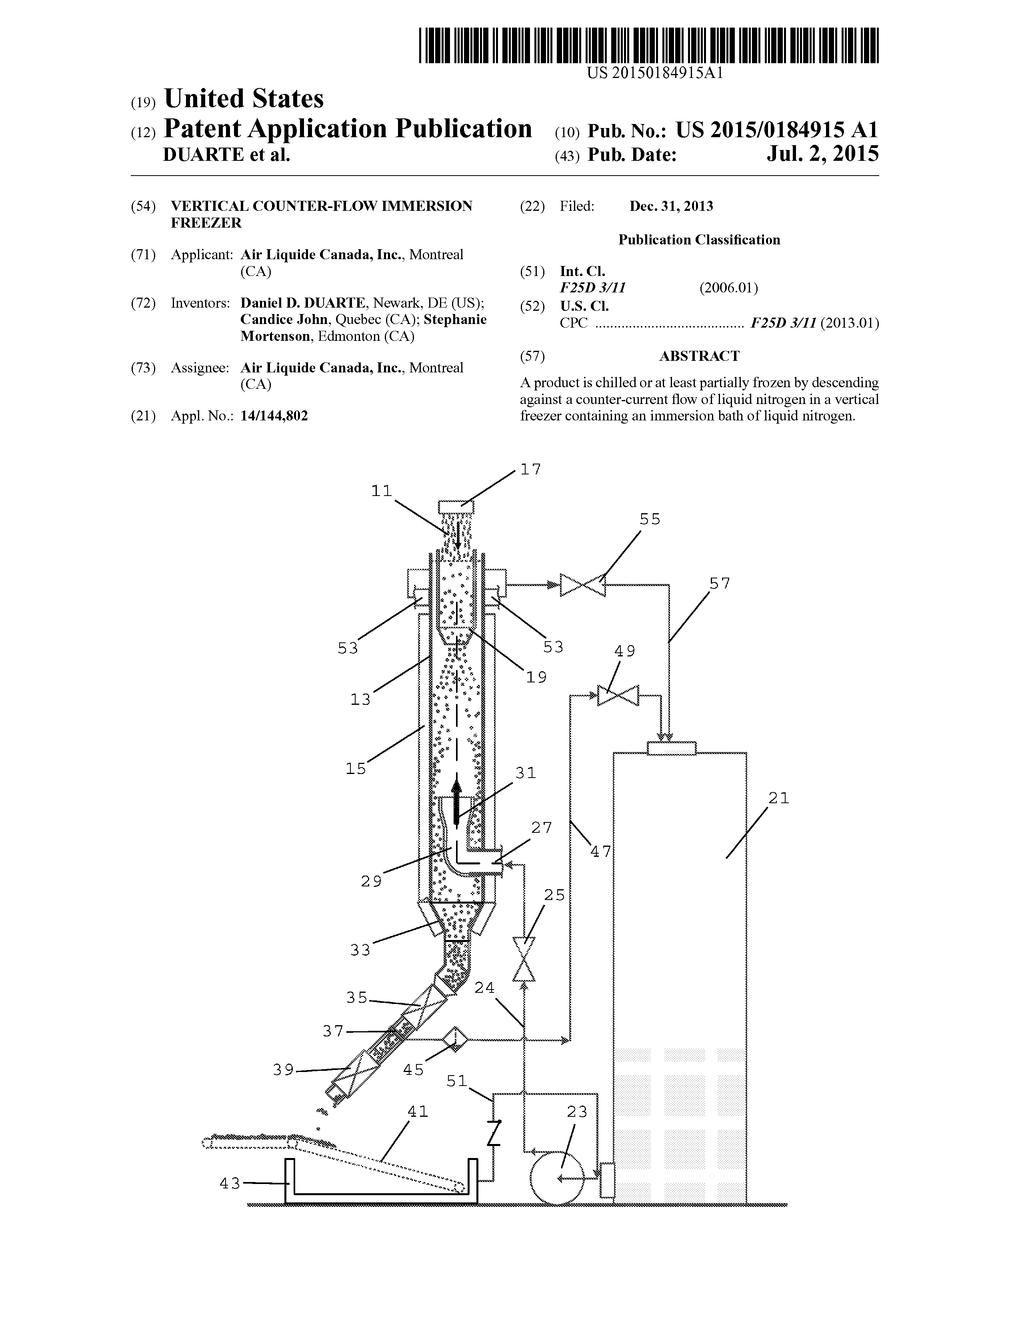 Vertical counter flow immersion freezer diagram schematic and vertical counter flow immersion freezer diagram schematic and image 01 ccuart Gallery